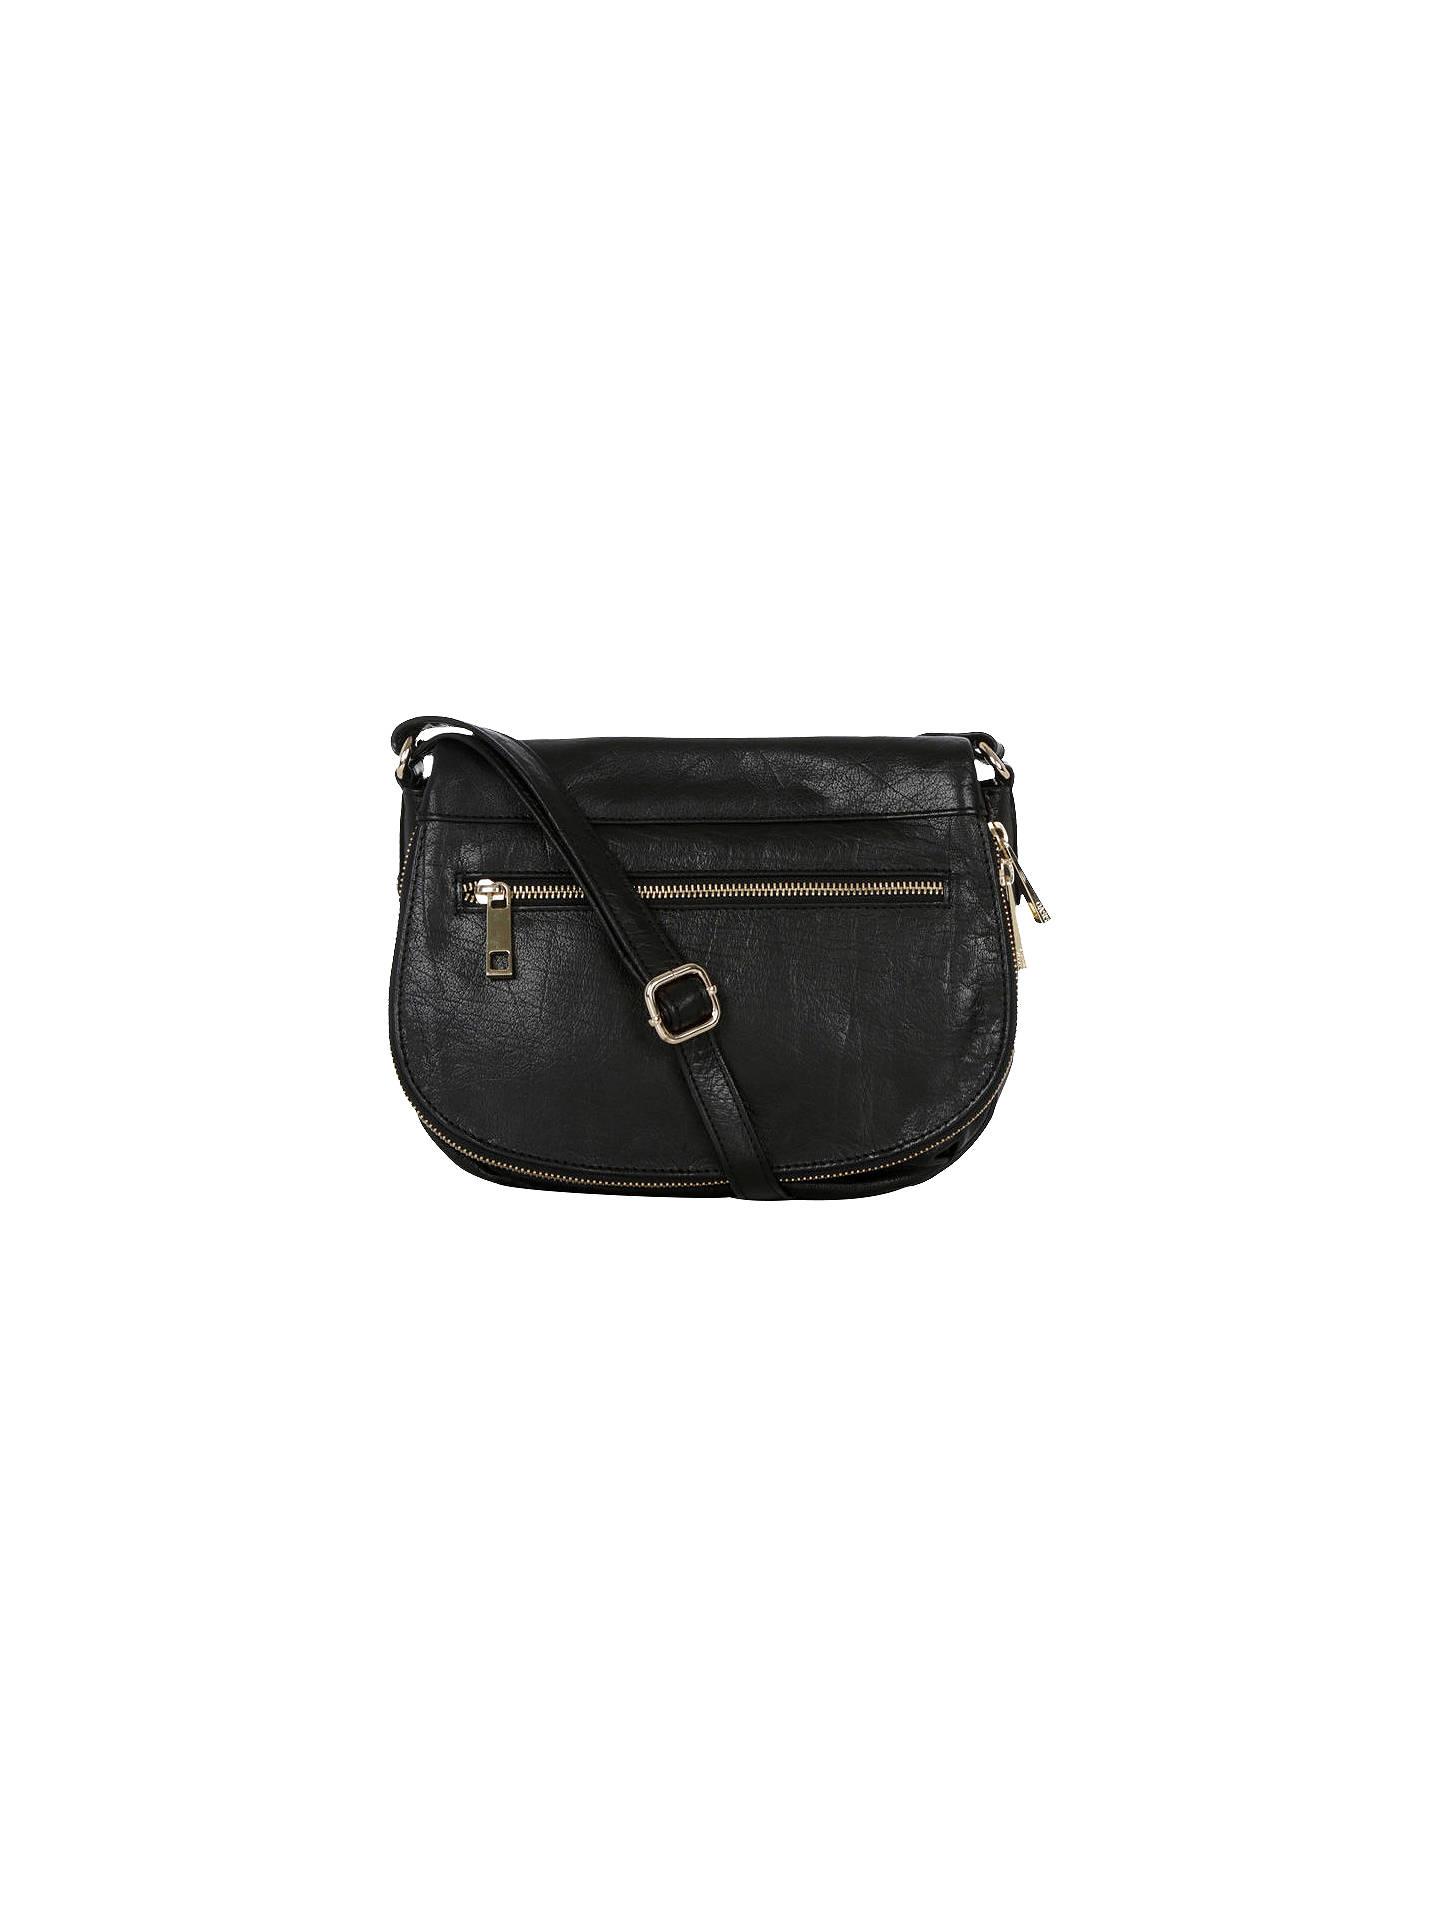 b7fb036120db Buy Oasis Leather Anais Satchel, Black Online at johnlewis.com ...